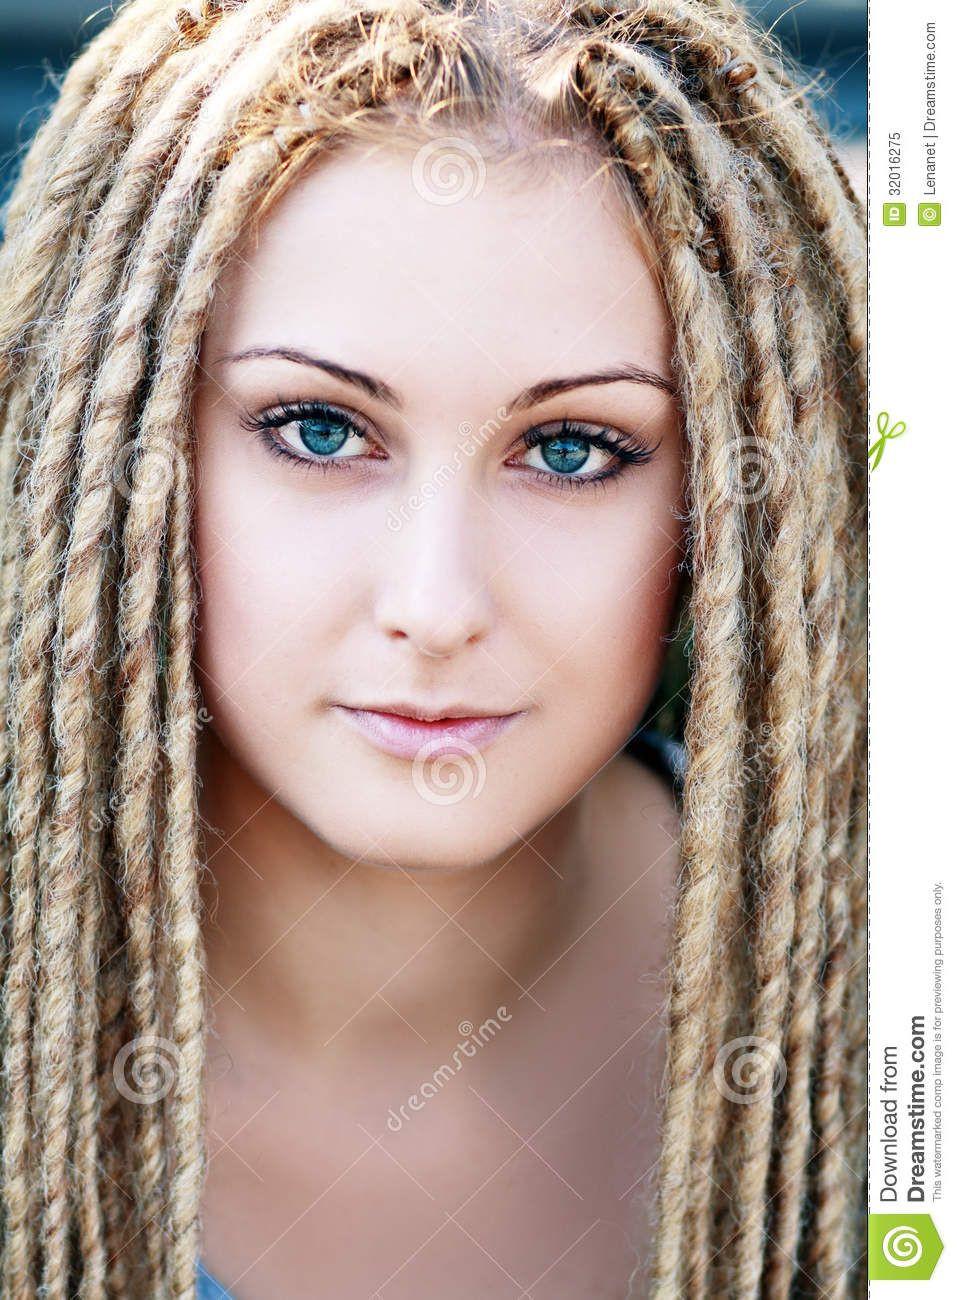 White Girl Dread Hairstyles  white girl dreads Google Search Dreadlocks